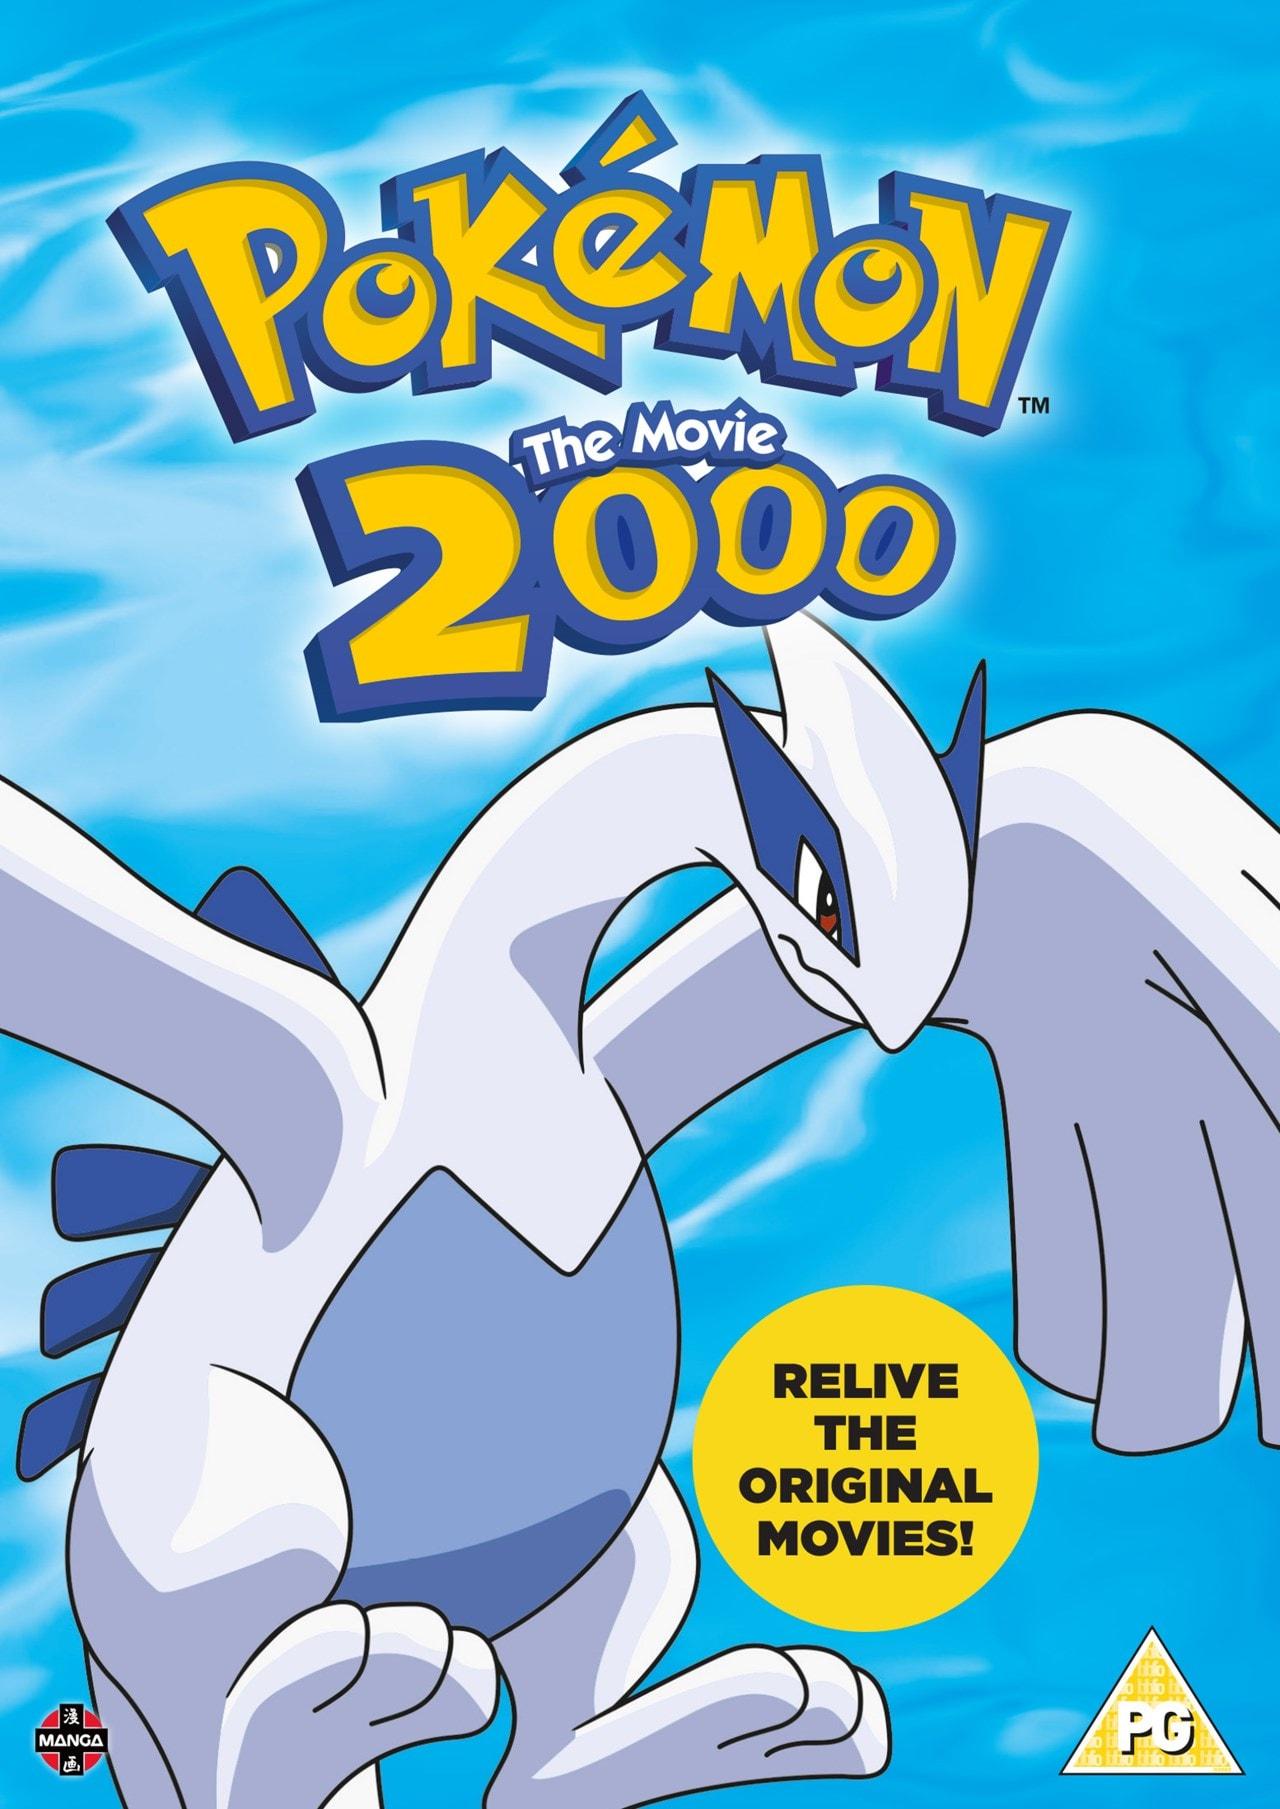 Pokemon - The Movie: 2000 - 1